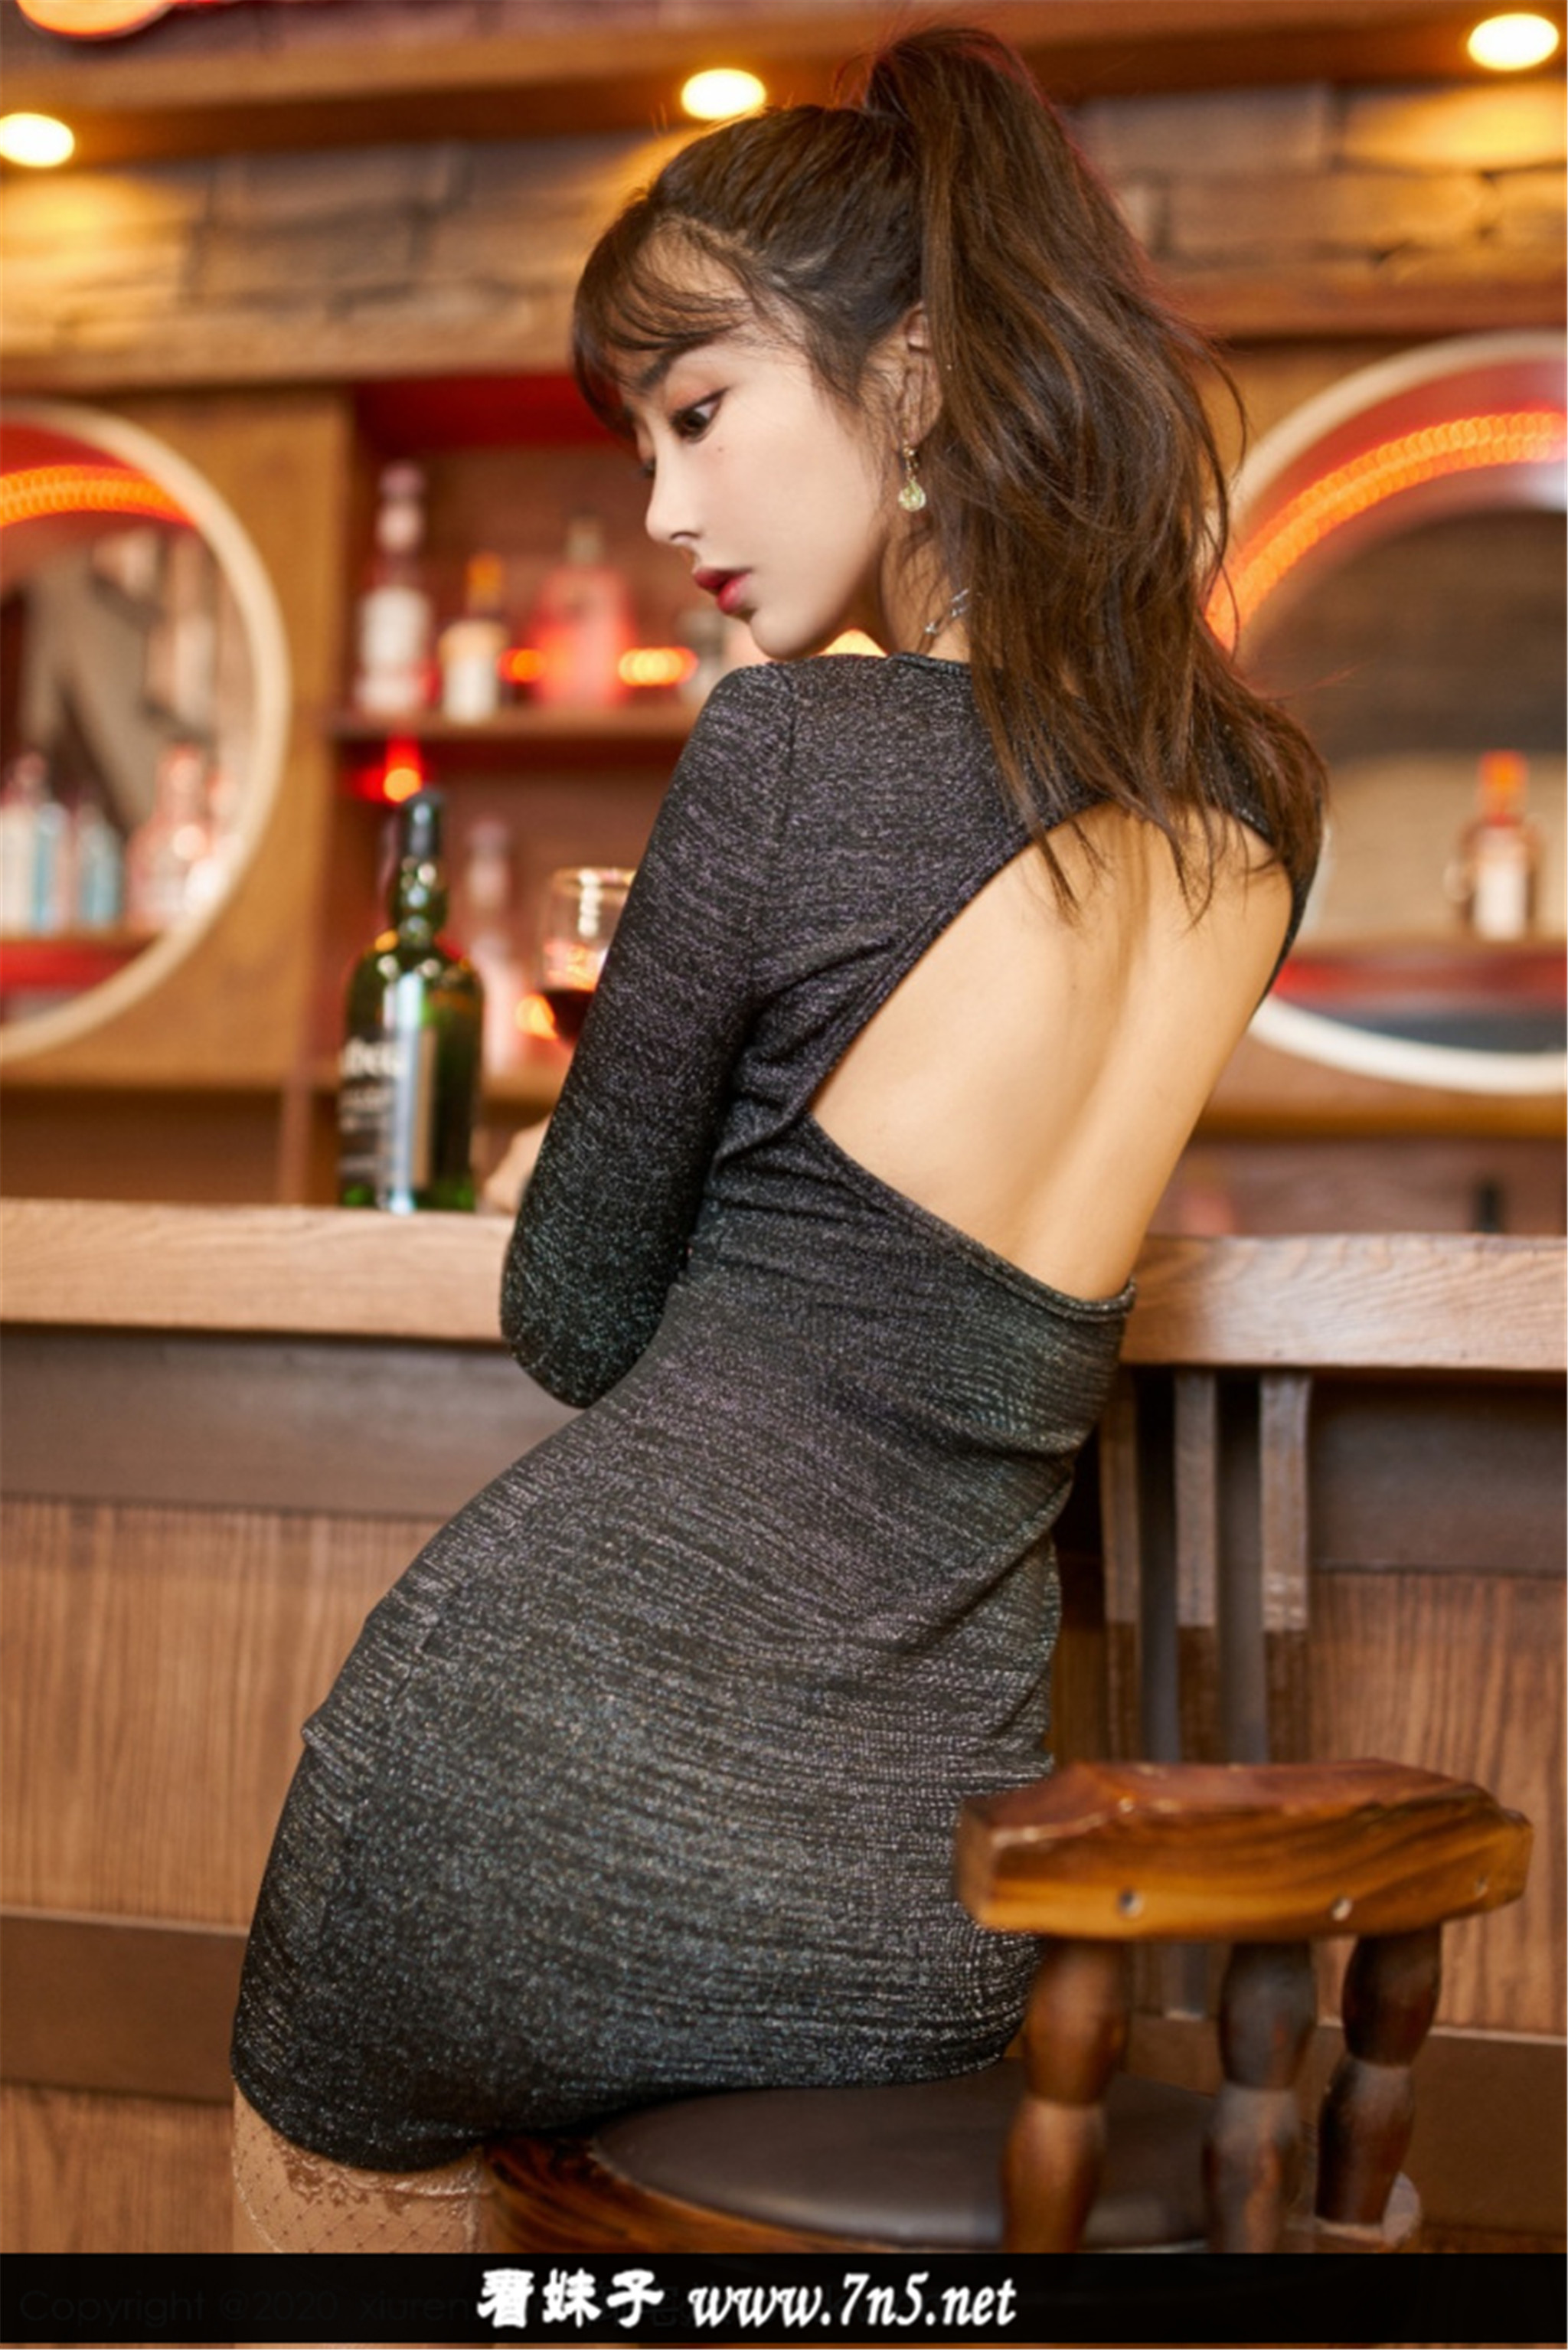 [Xiuren秀人网]2020.03.20 NO.2085 酒吧丝袜主题 Betty林子欣[41+1P/165M]